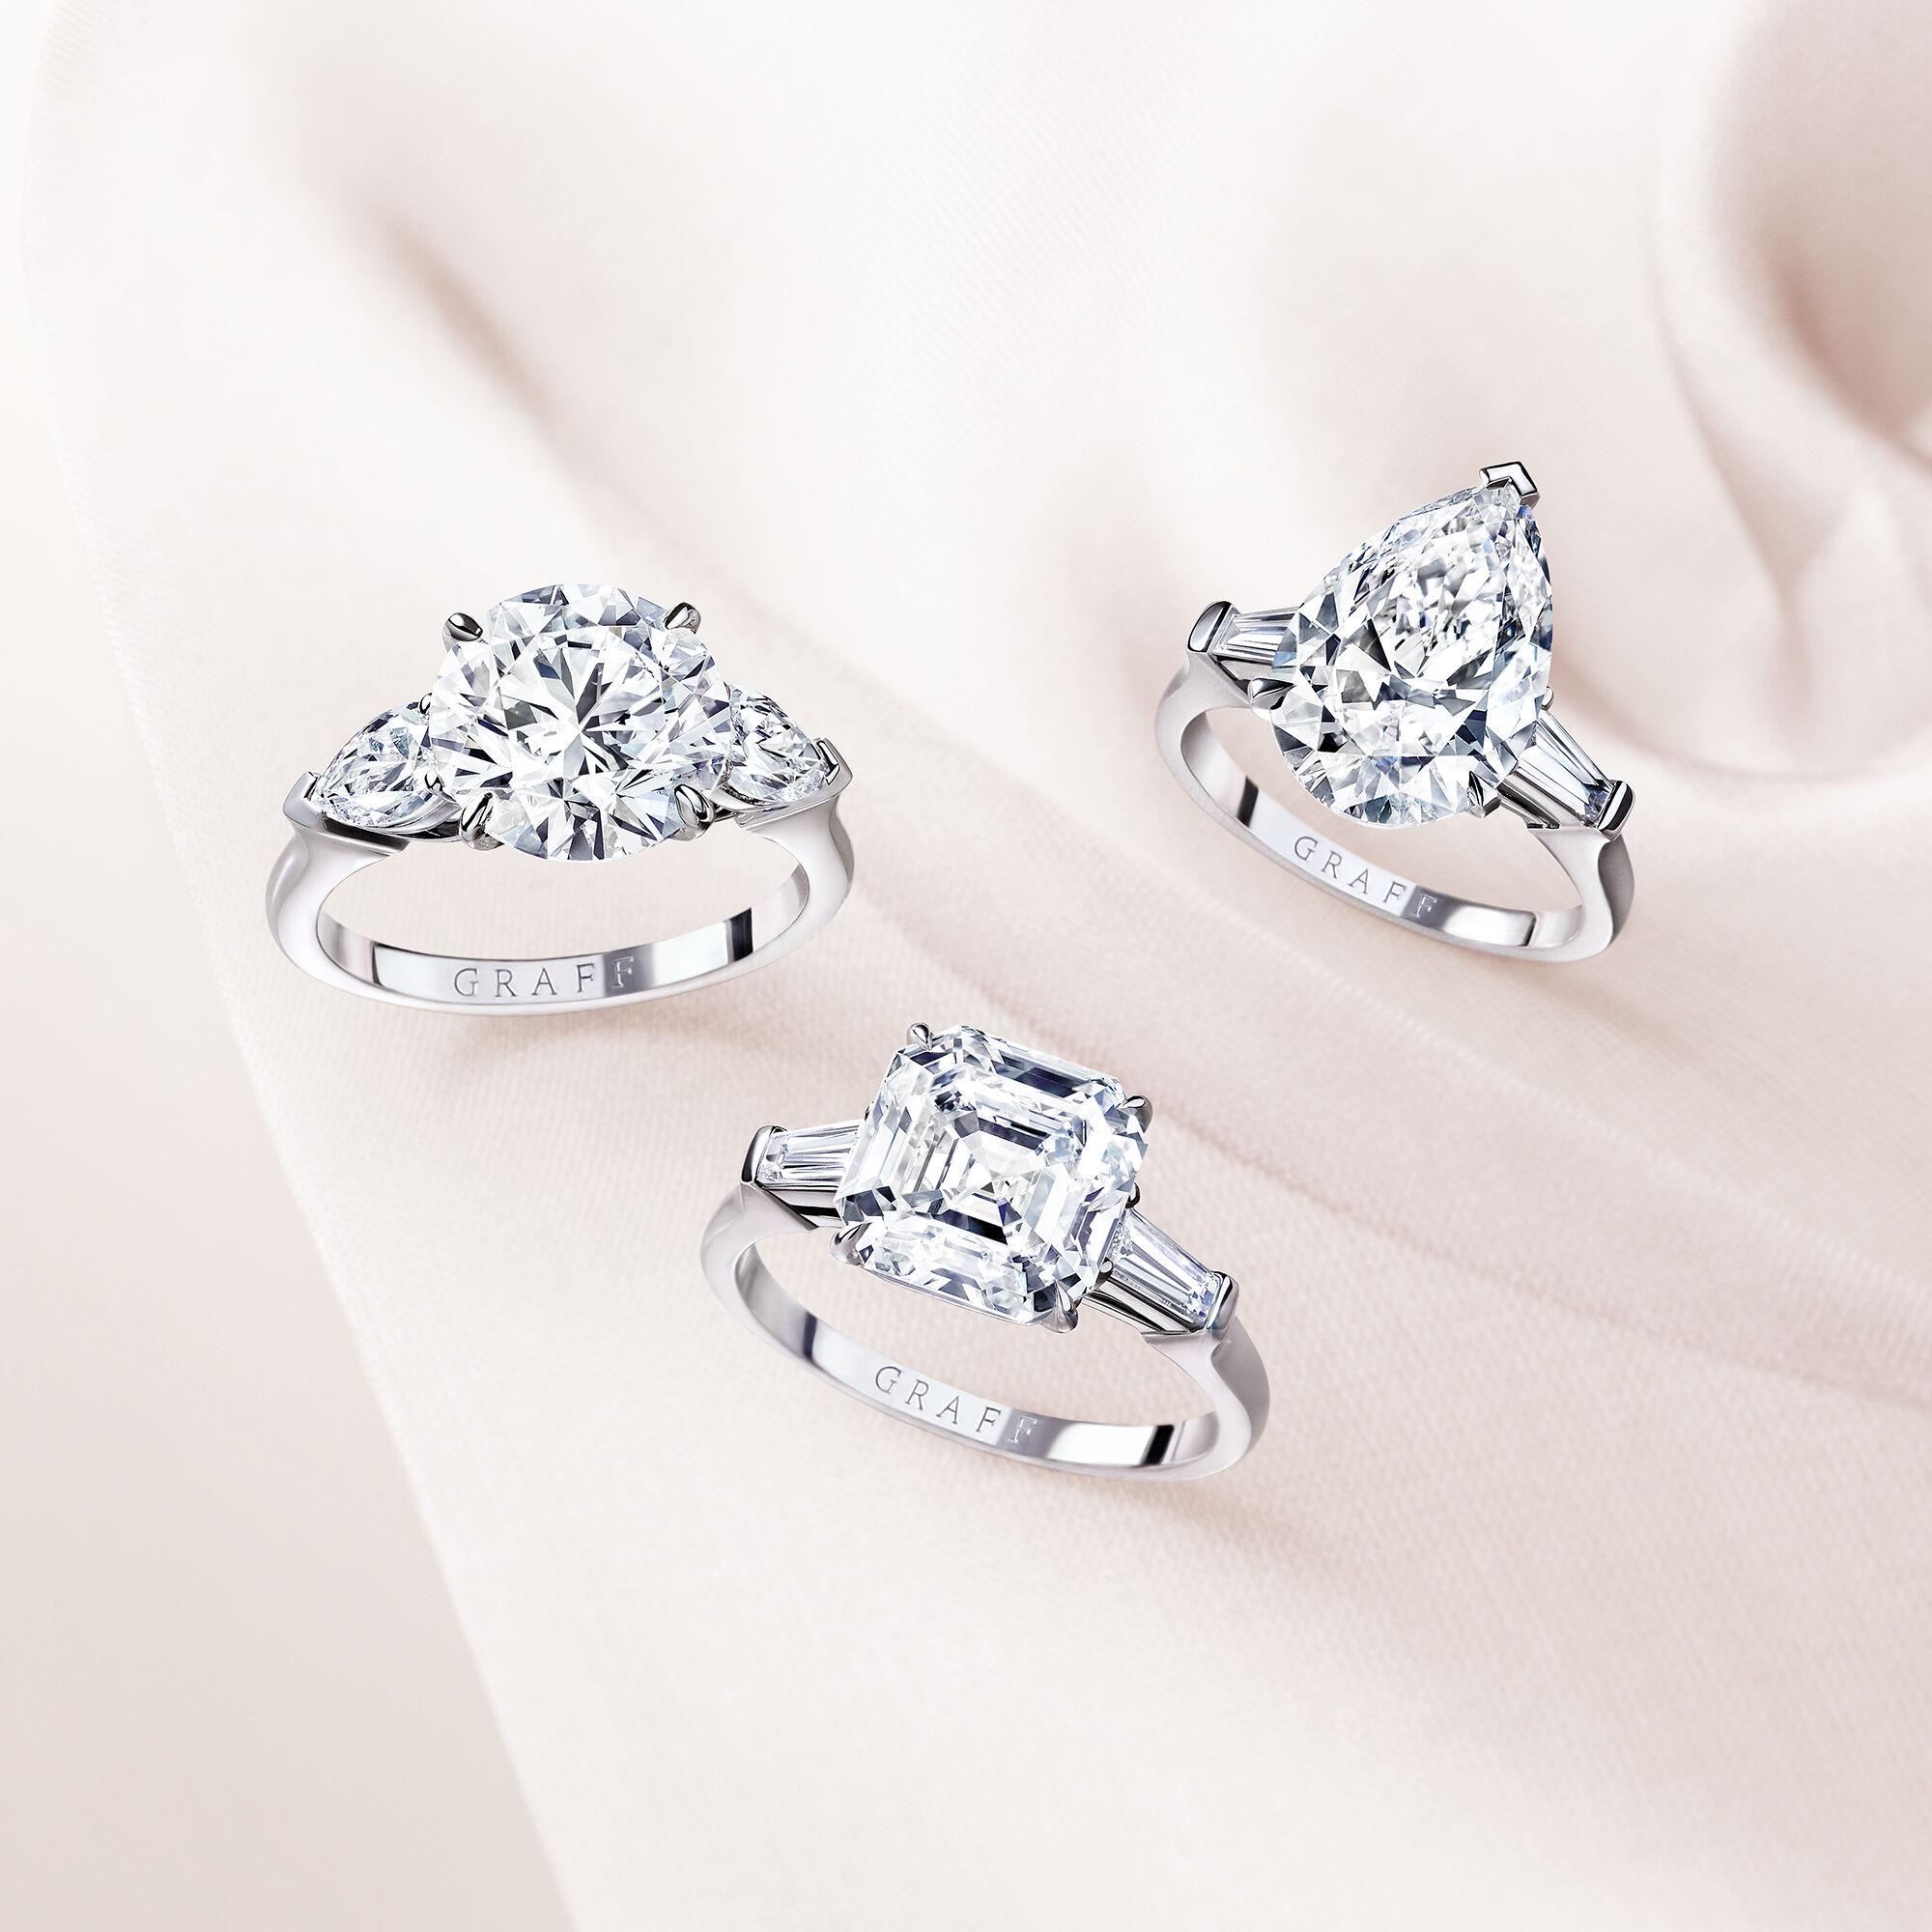 Three Graff promise engagement rings set with round diamond, pear Shape Diamond and Square Emerald Cut Diamond